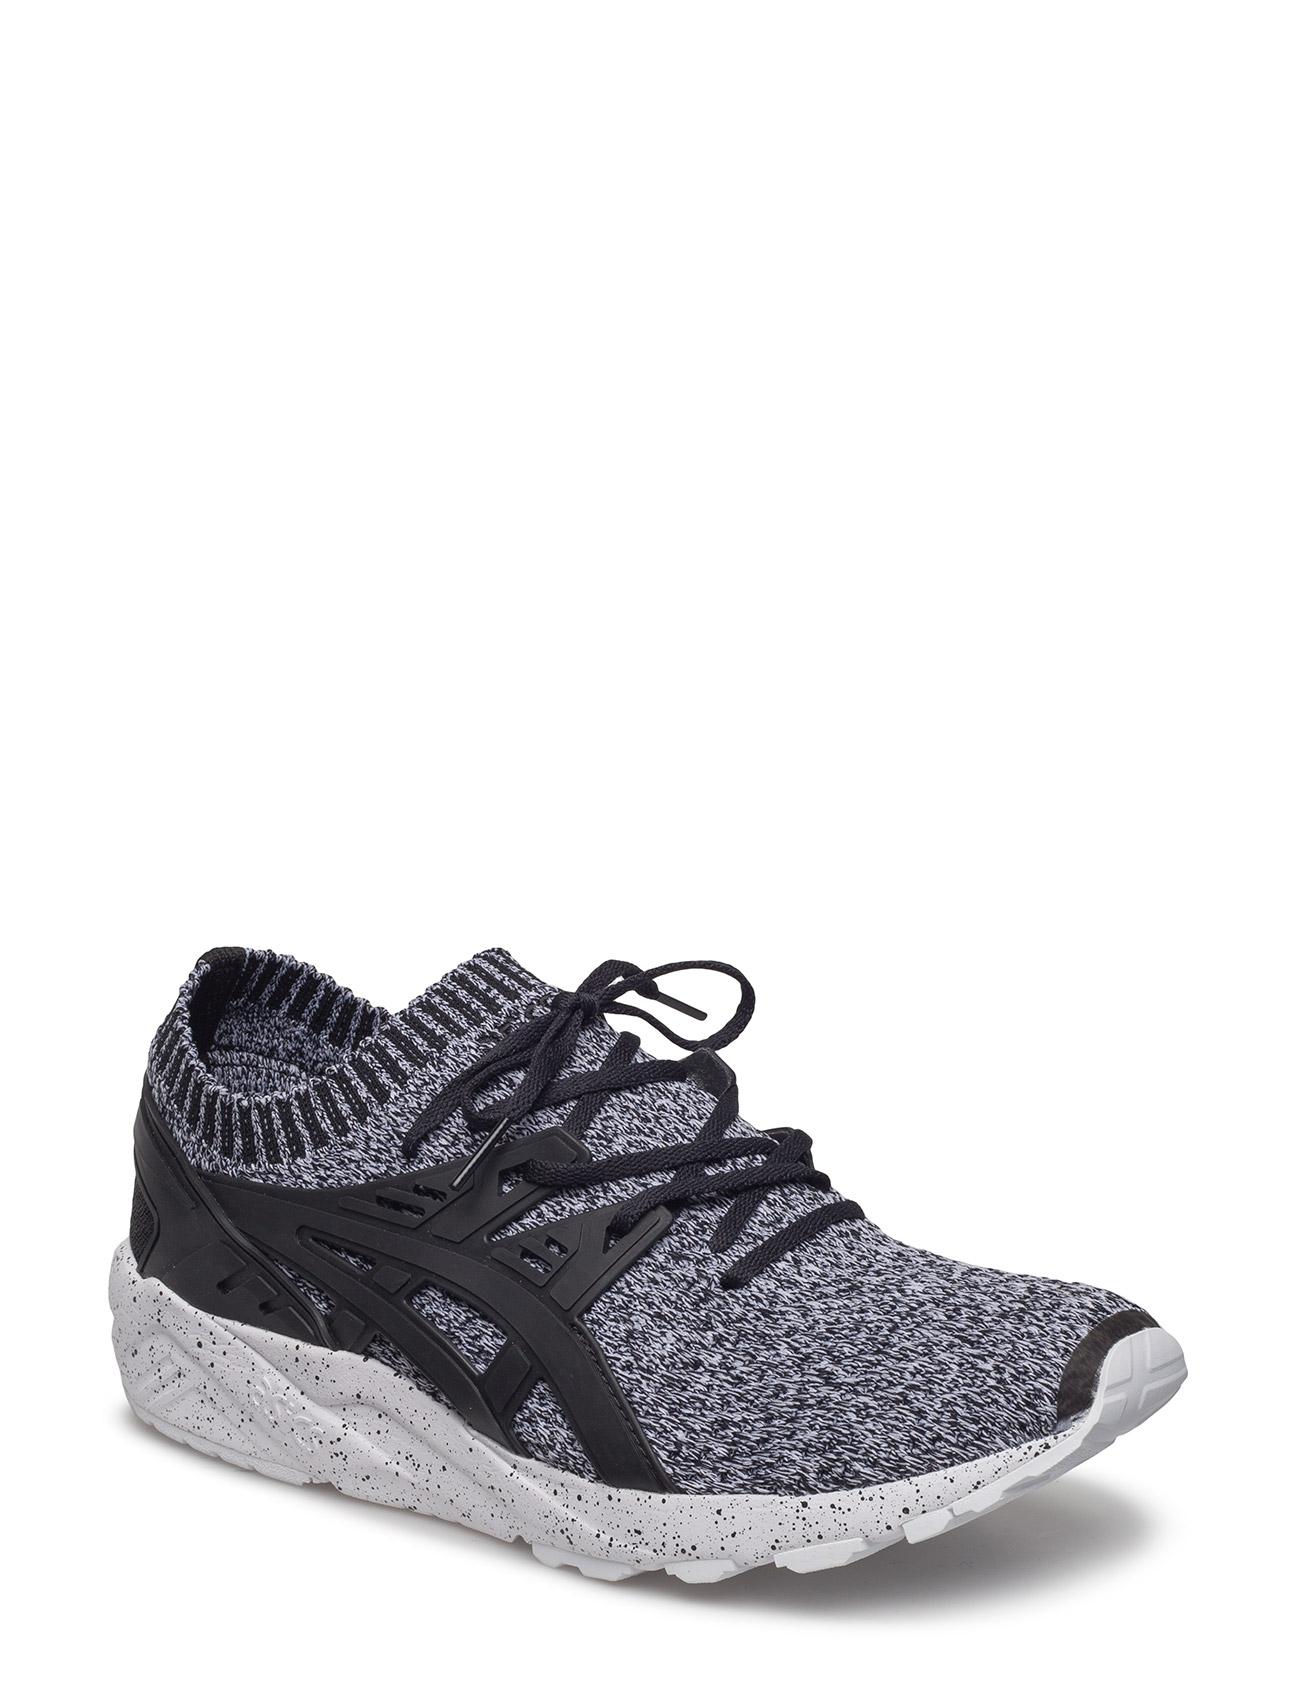 Asics Gel-Kayano Trainer Knit 325768287